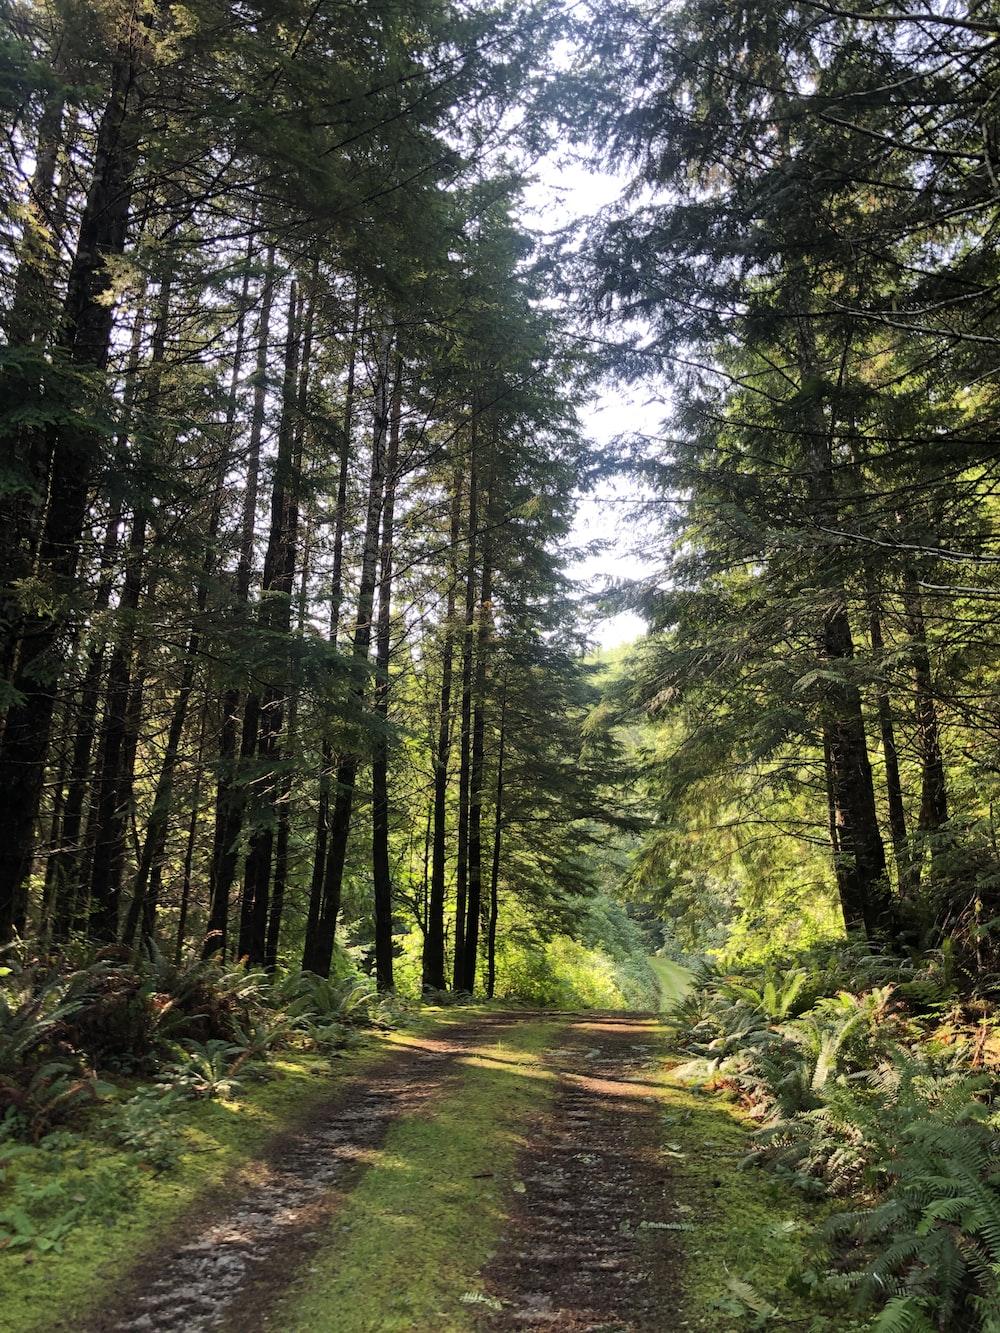 dirt road under trees